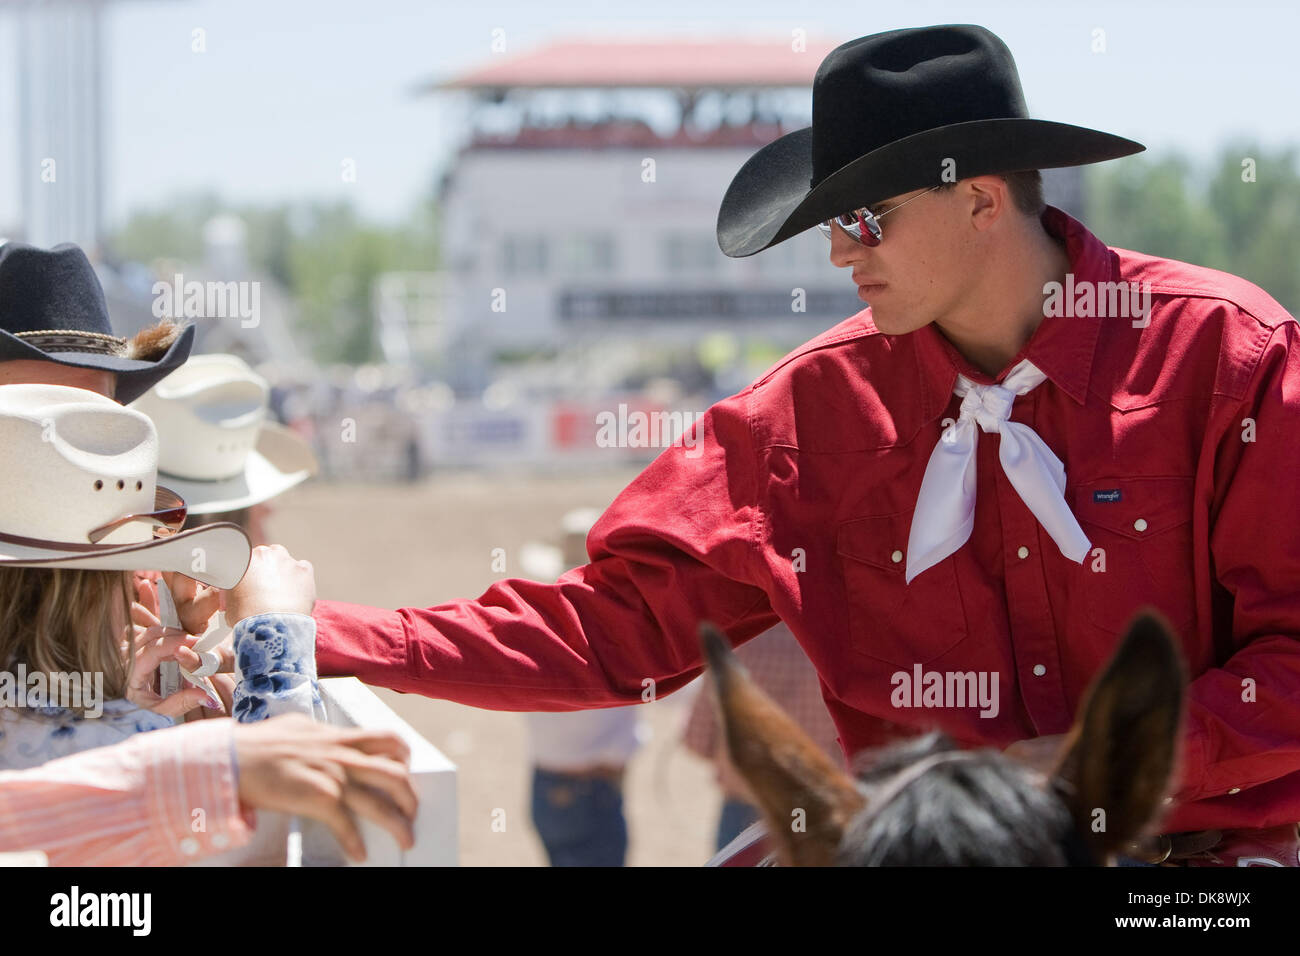 July 31 2011 Cheyenne Wyoming U S Rodeo Pick Up